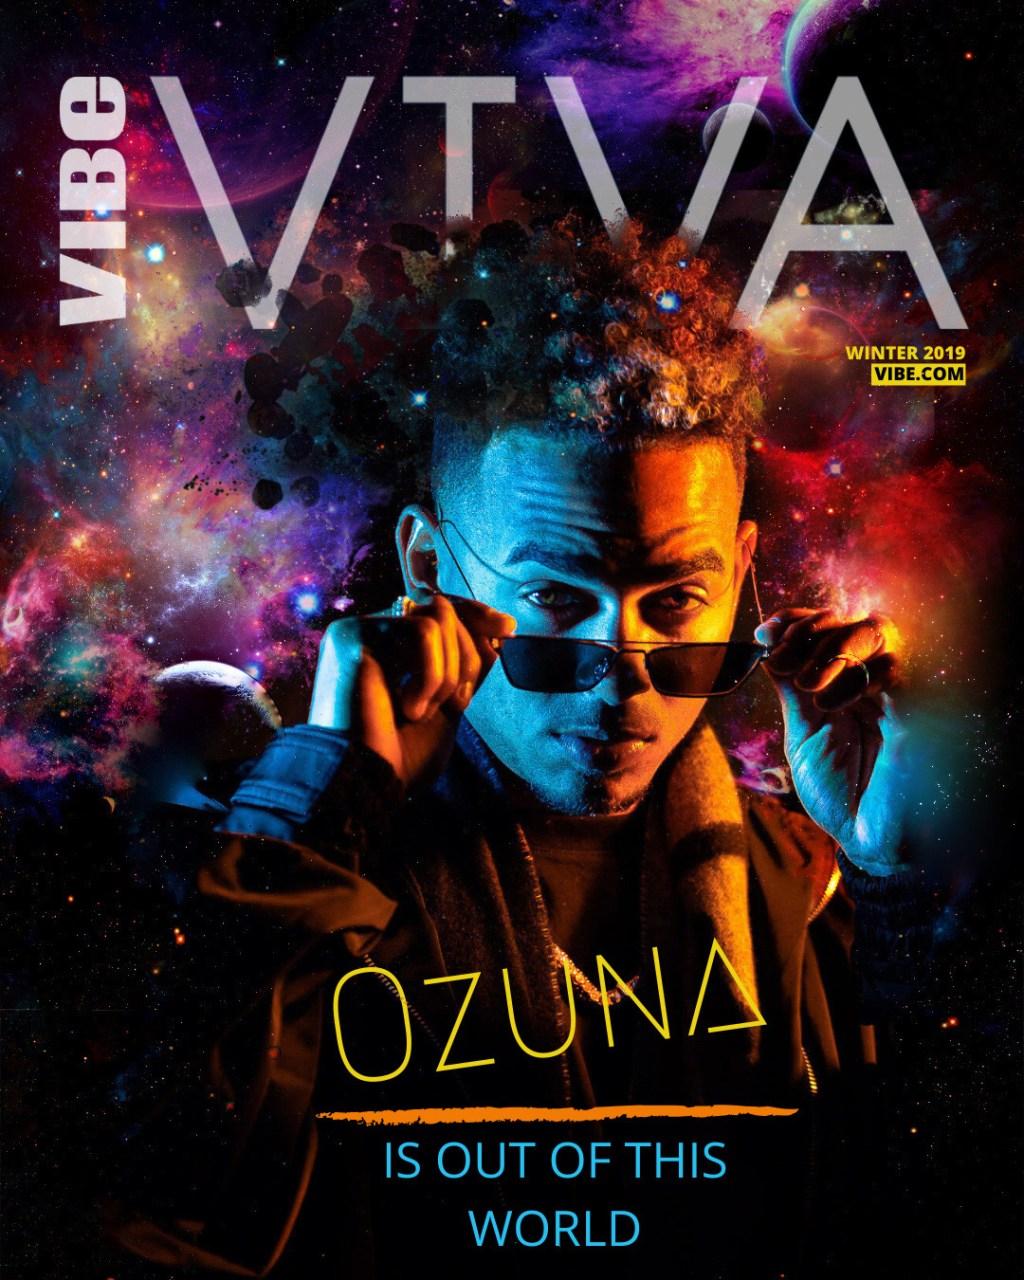 VIBE-VIVA-OZUNA-WINTER-2019